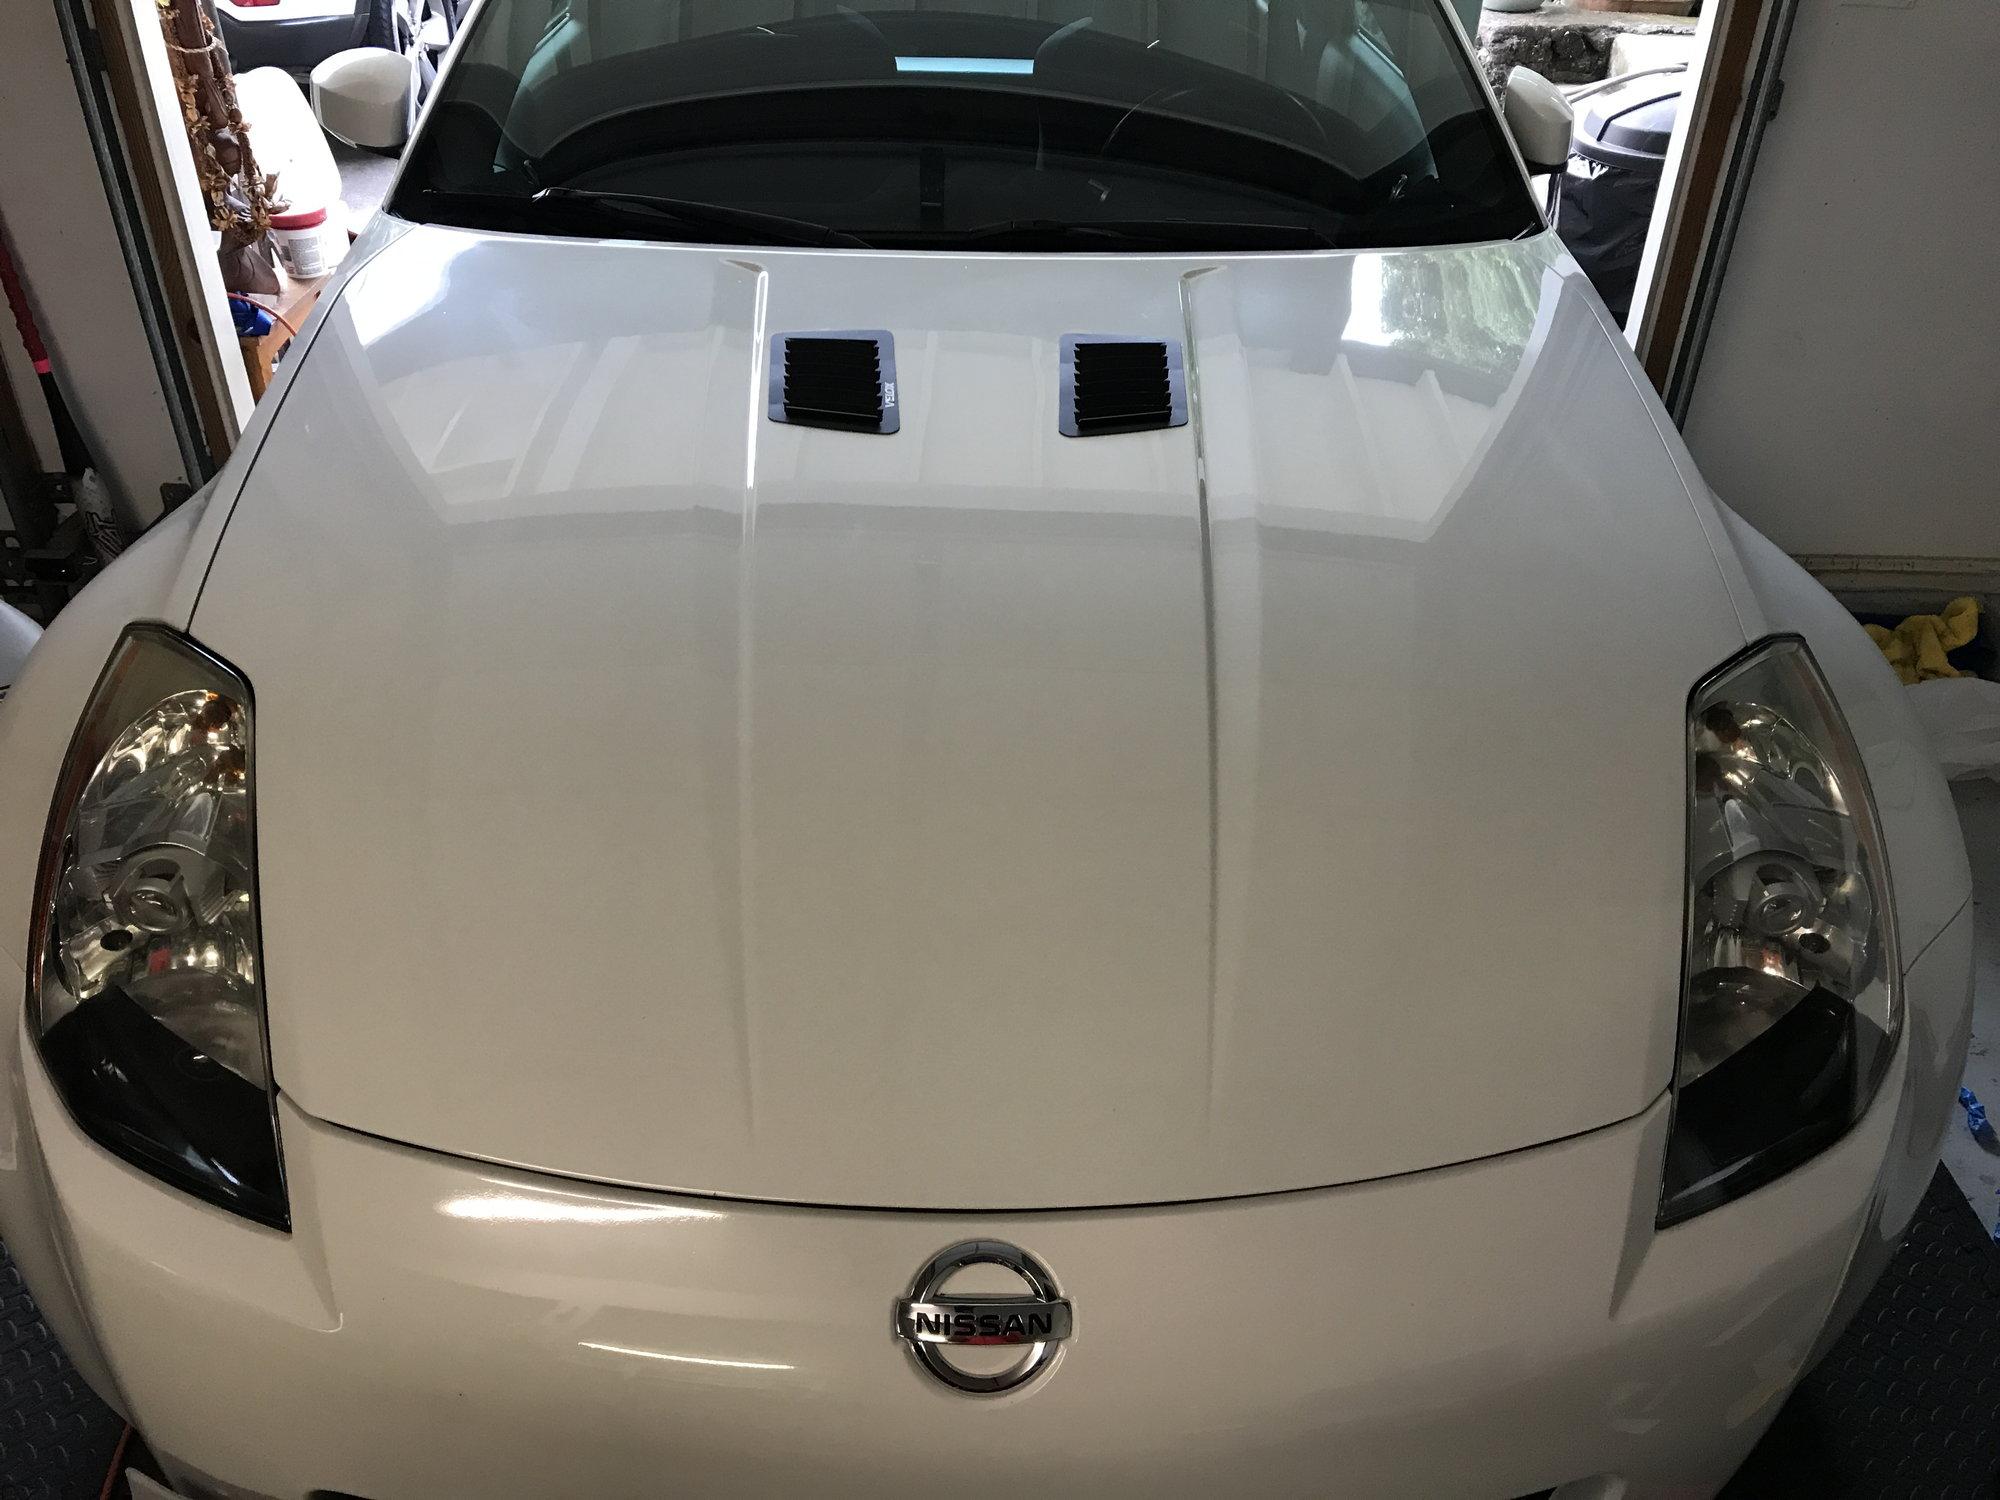 The abomination (350z with vr6) still lives - MY350Z COM - Nissan